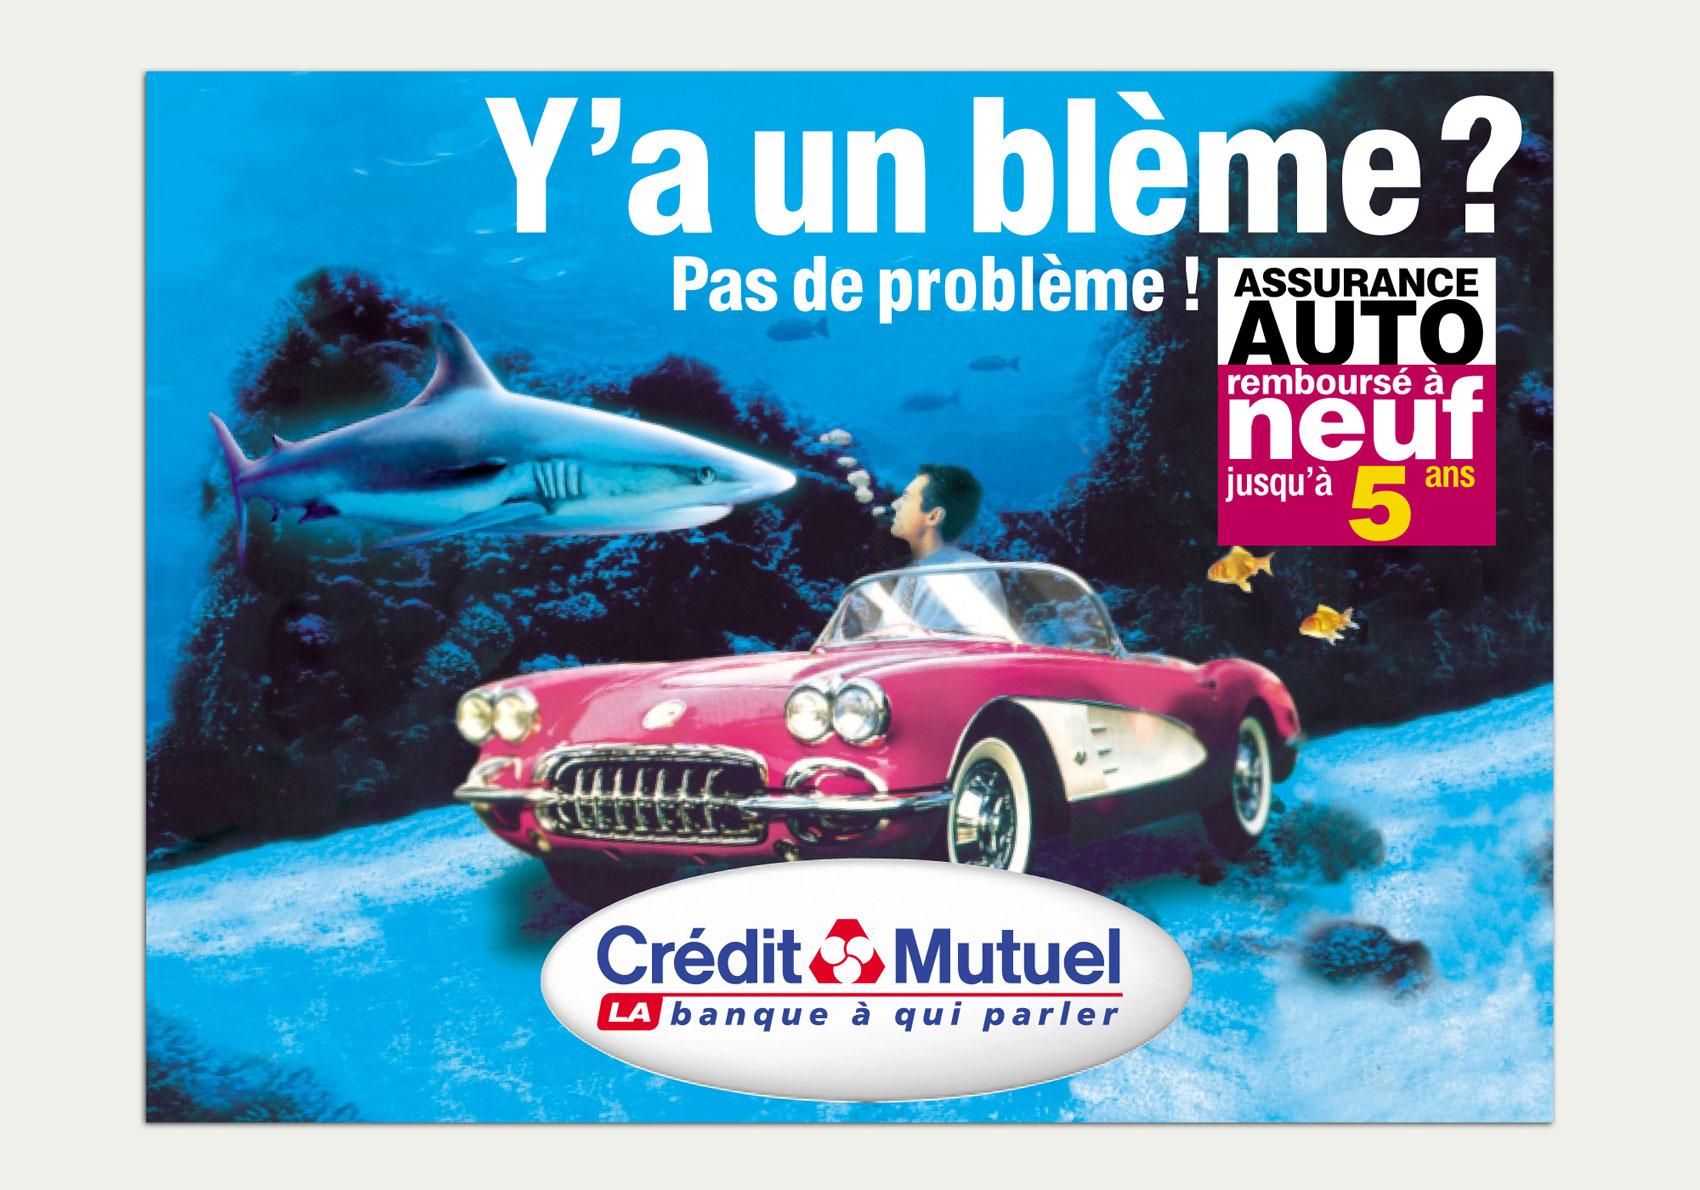 bancassurance-credit-mutuel-2002-5